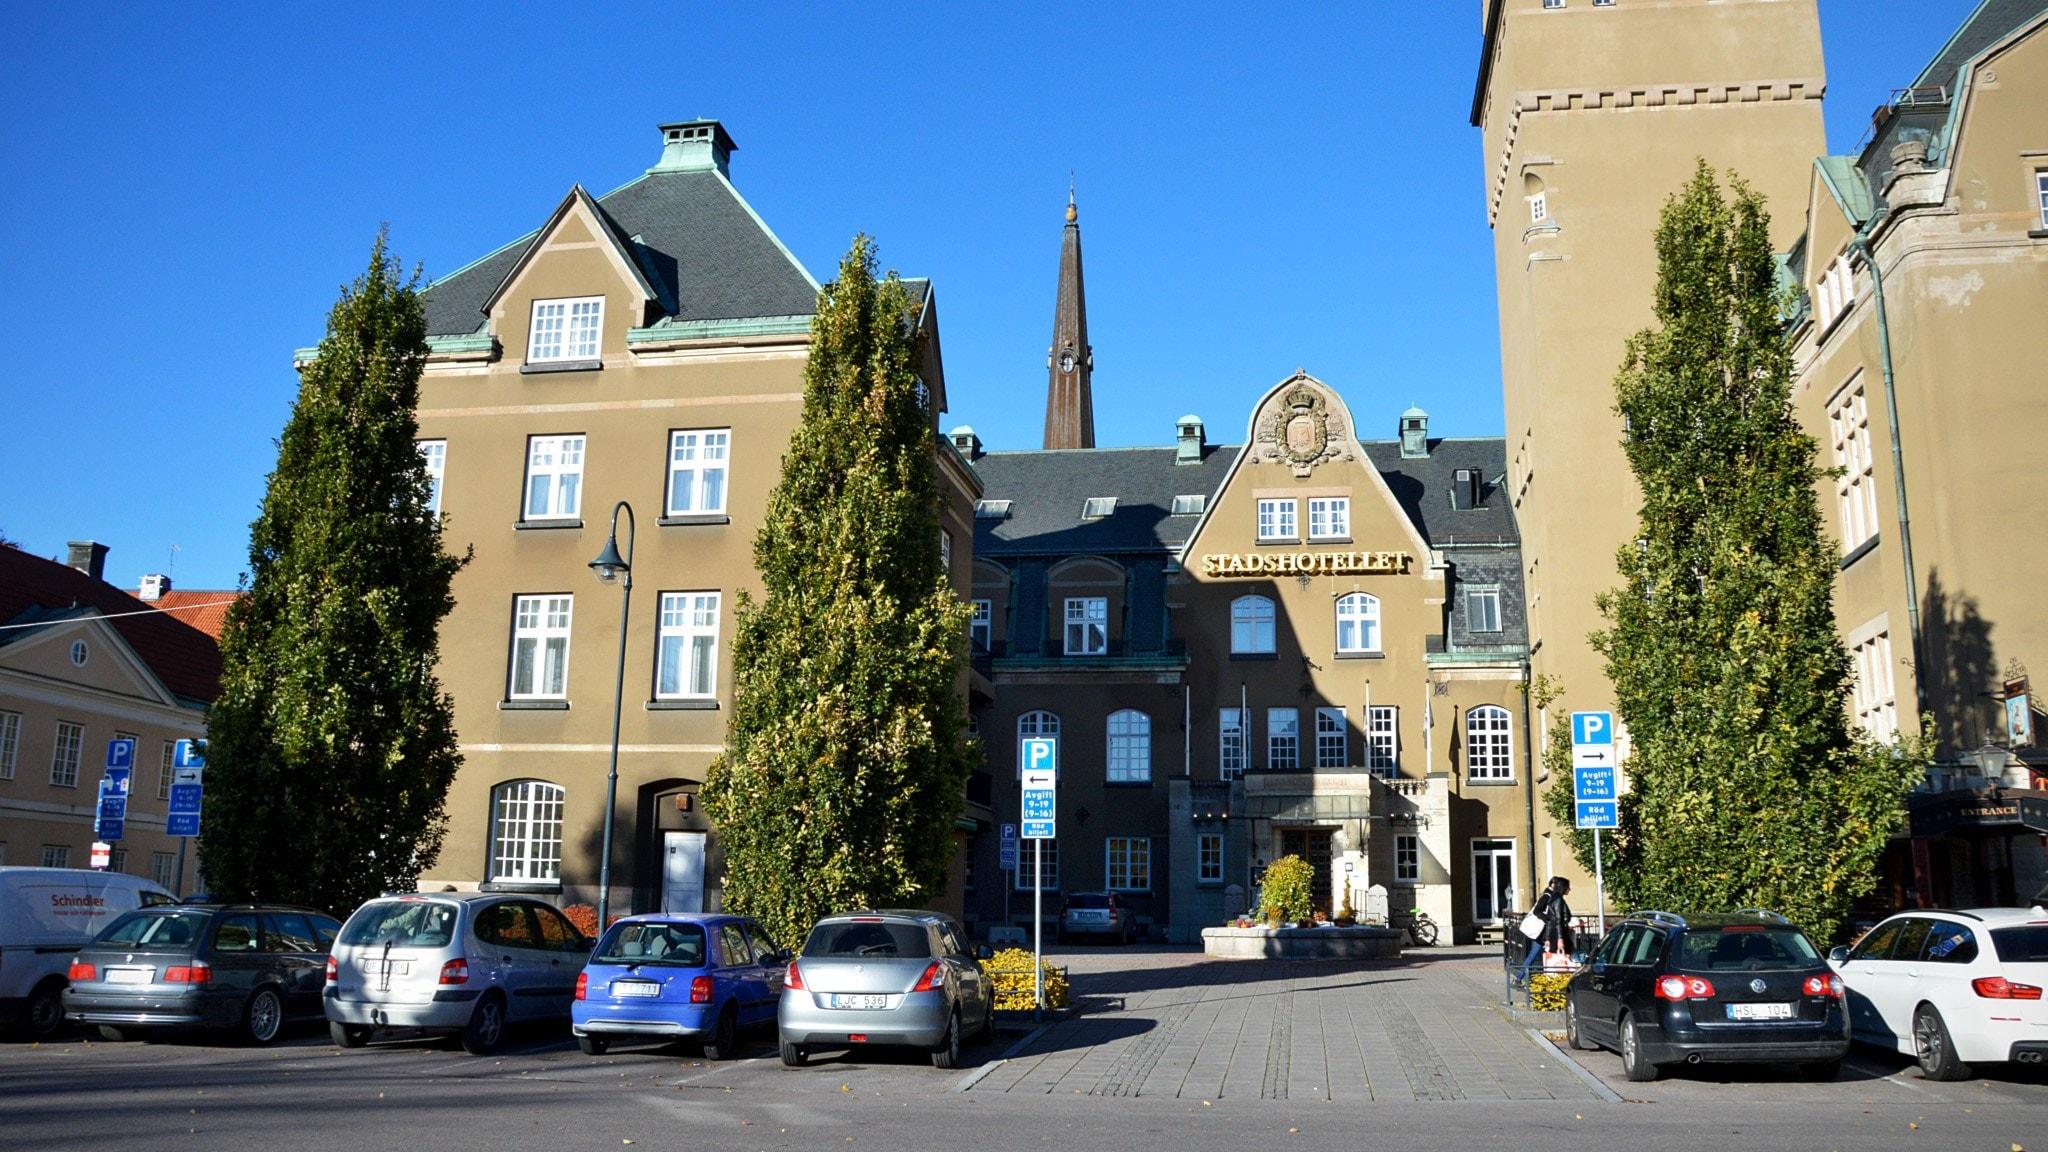 västerås stadshotell